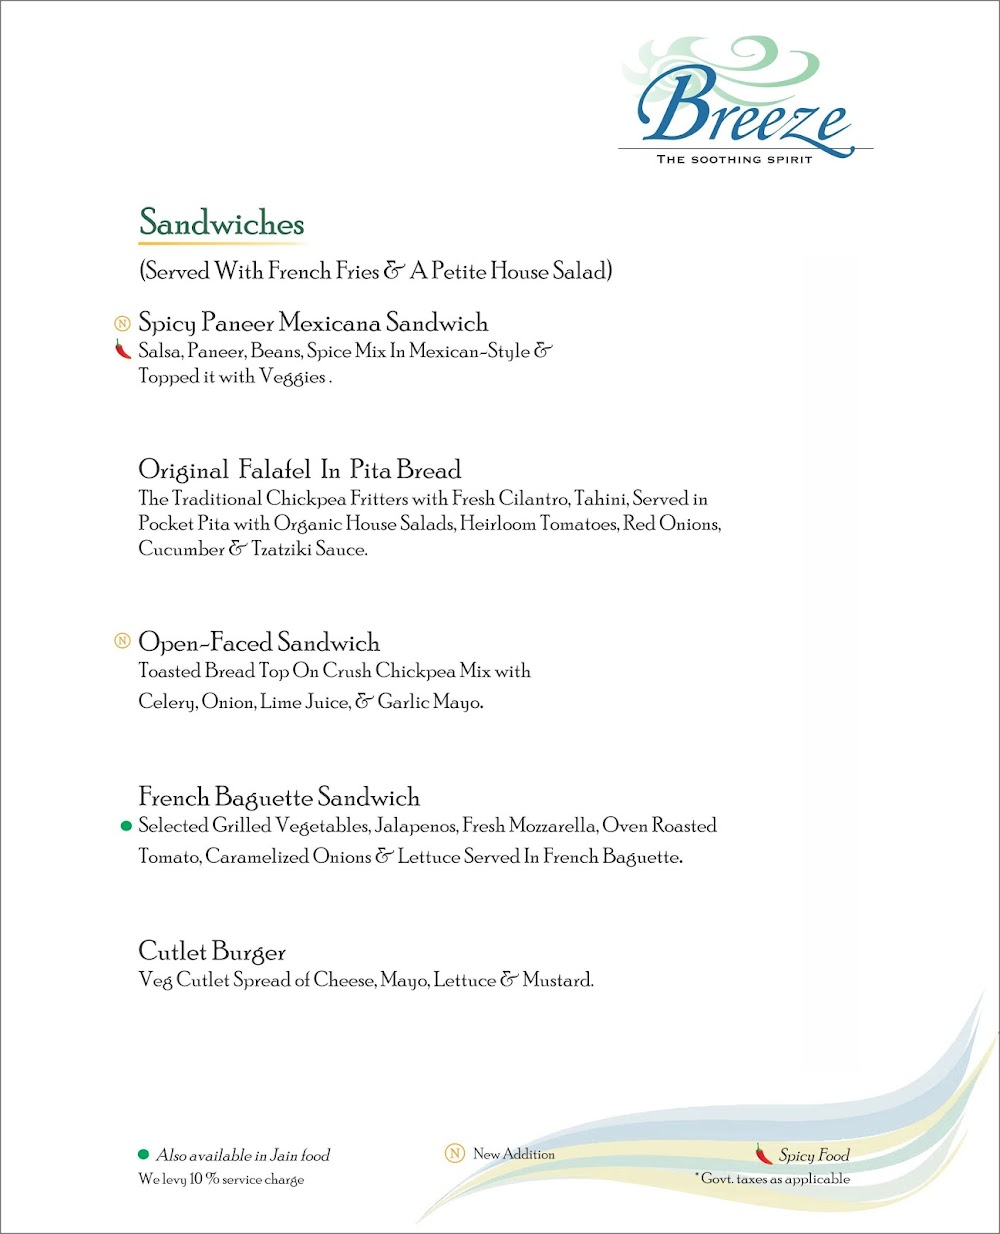 Breeze Lounge menu 5